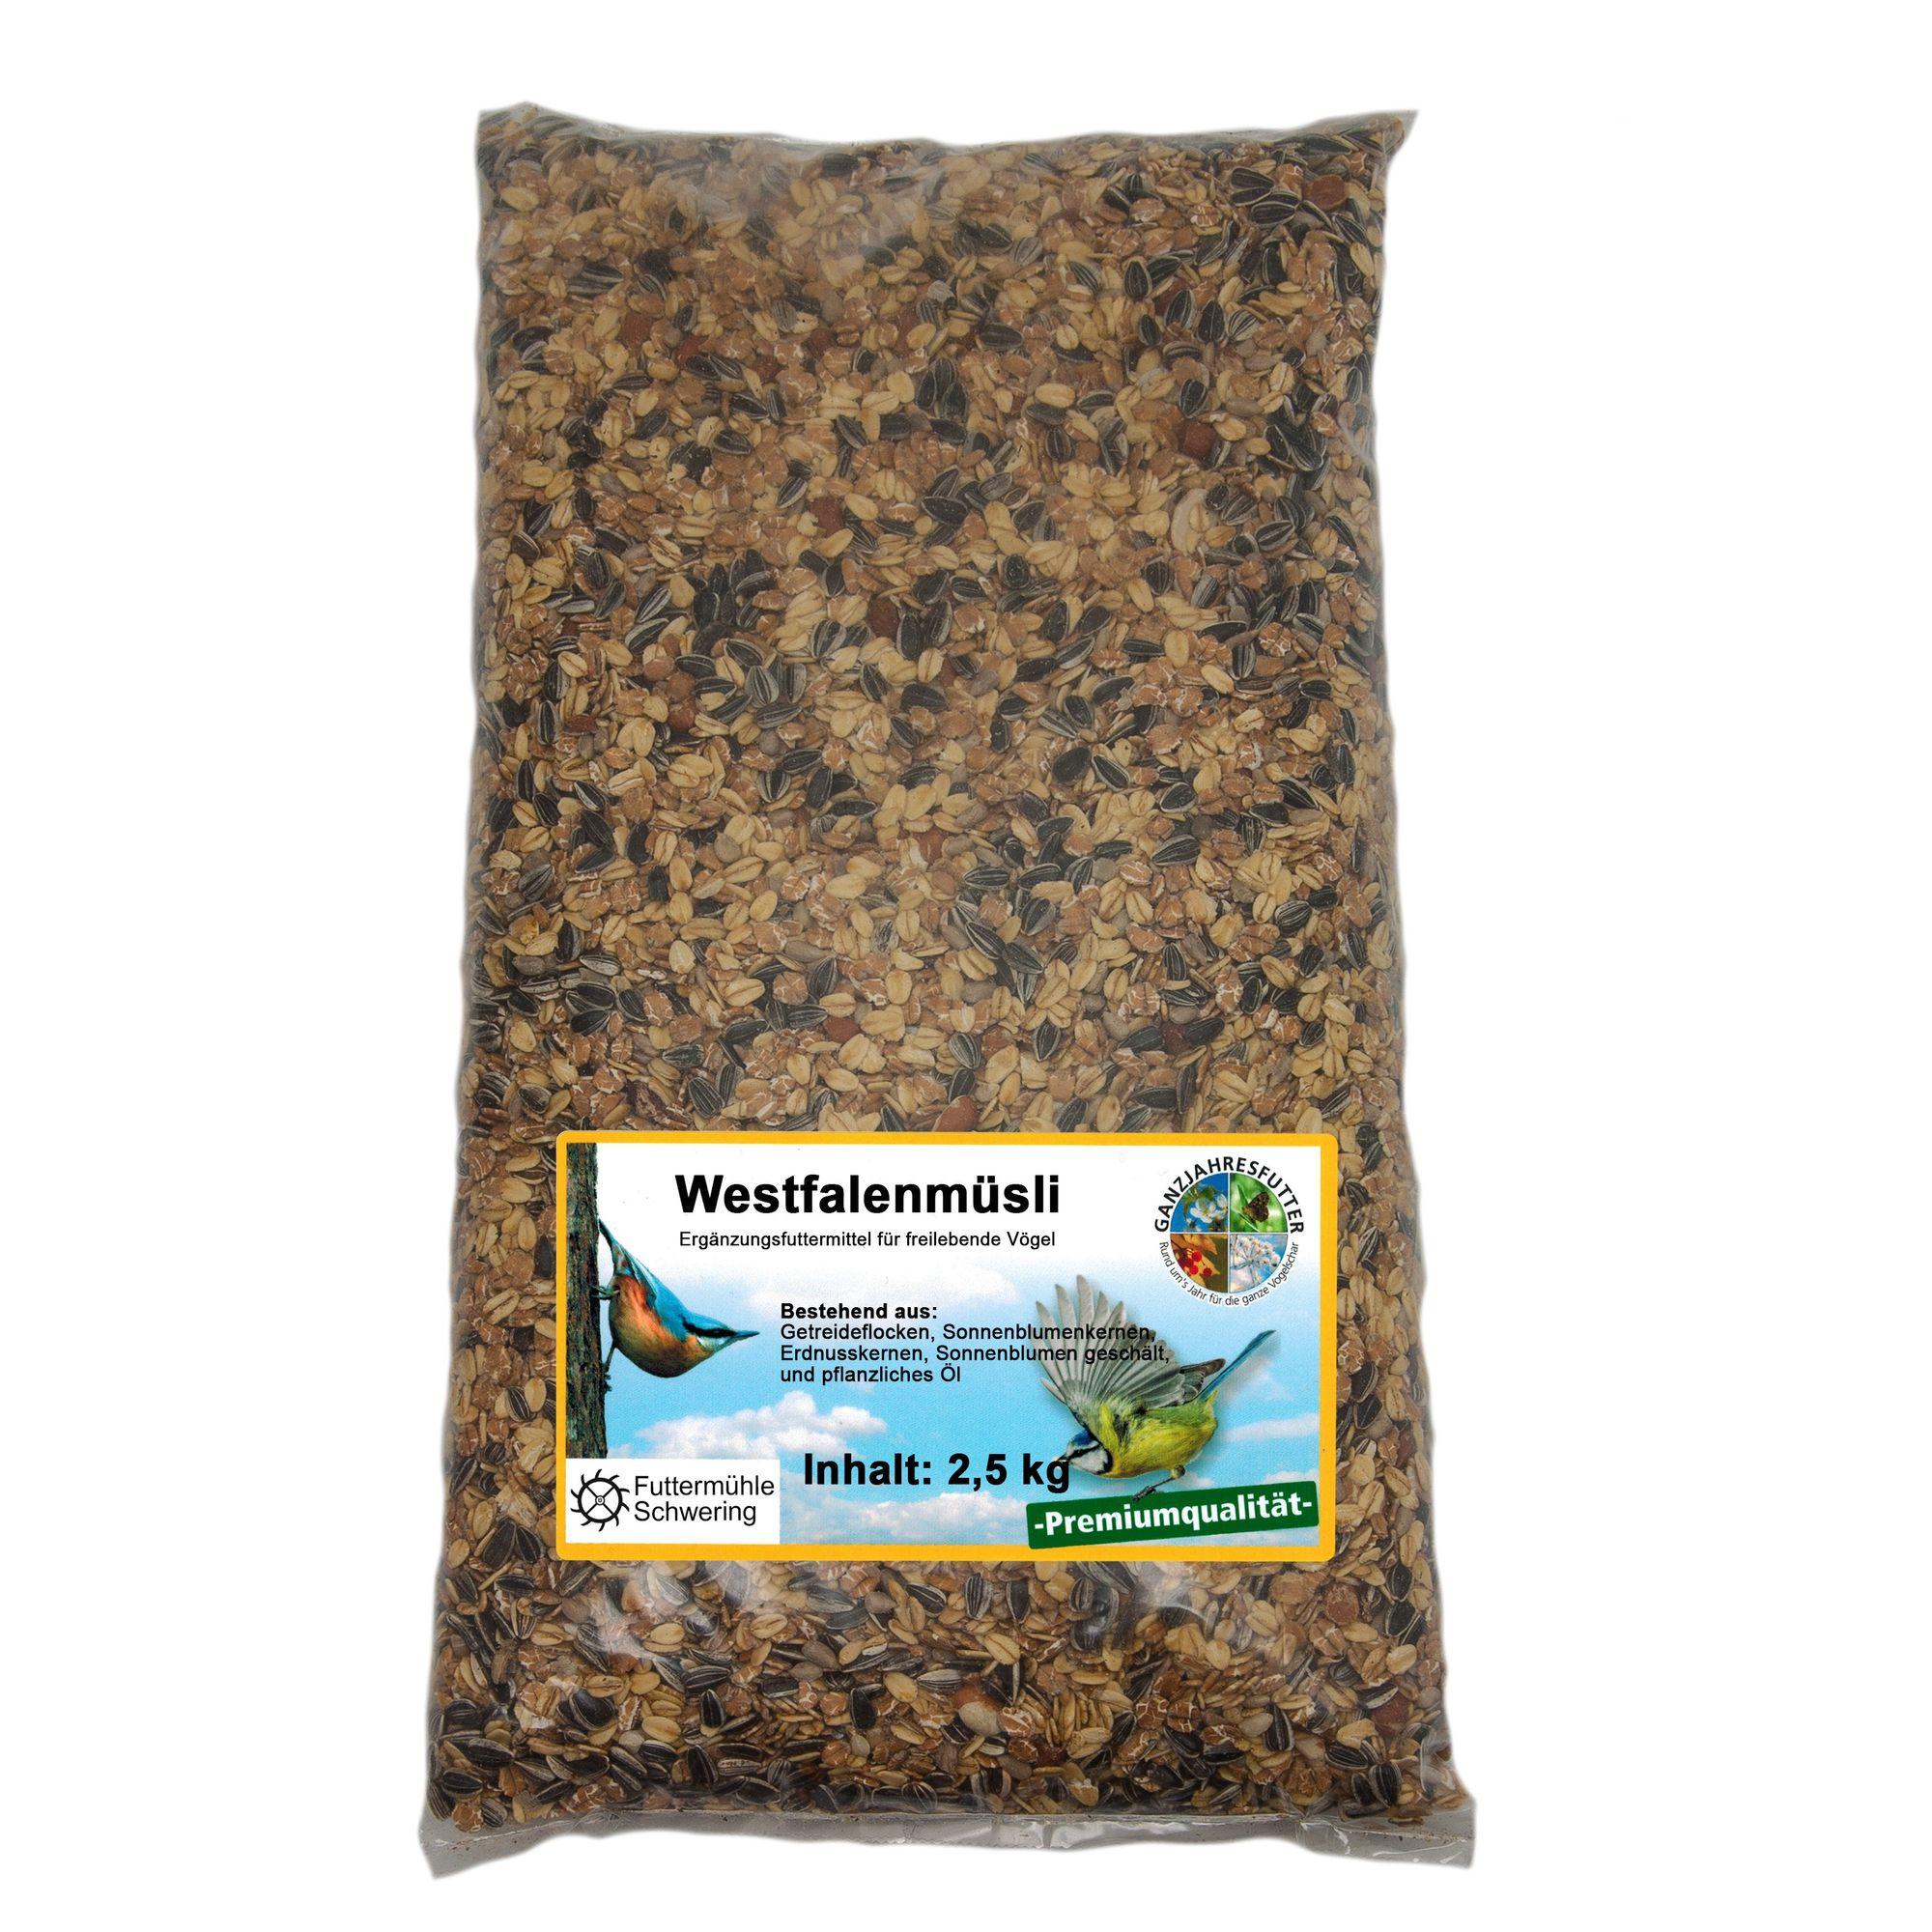 Westfalenmüsli, 2,5 kg Btl.